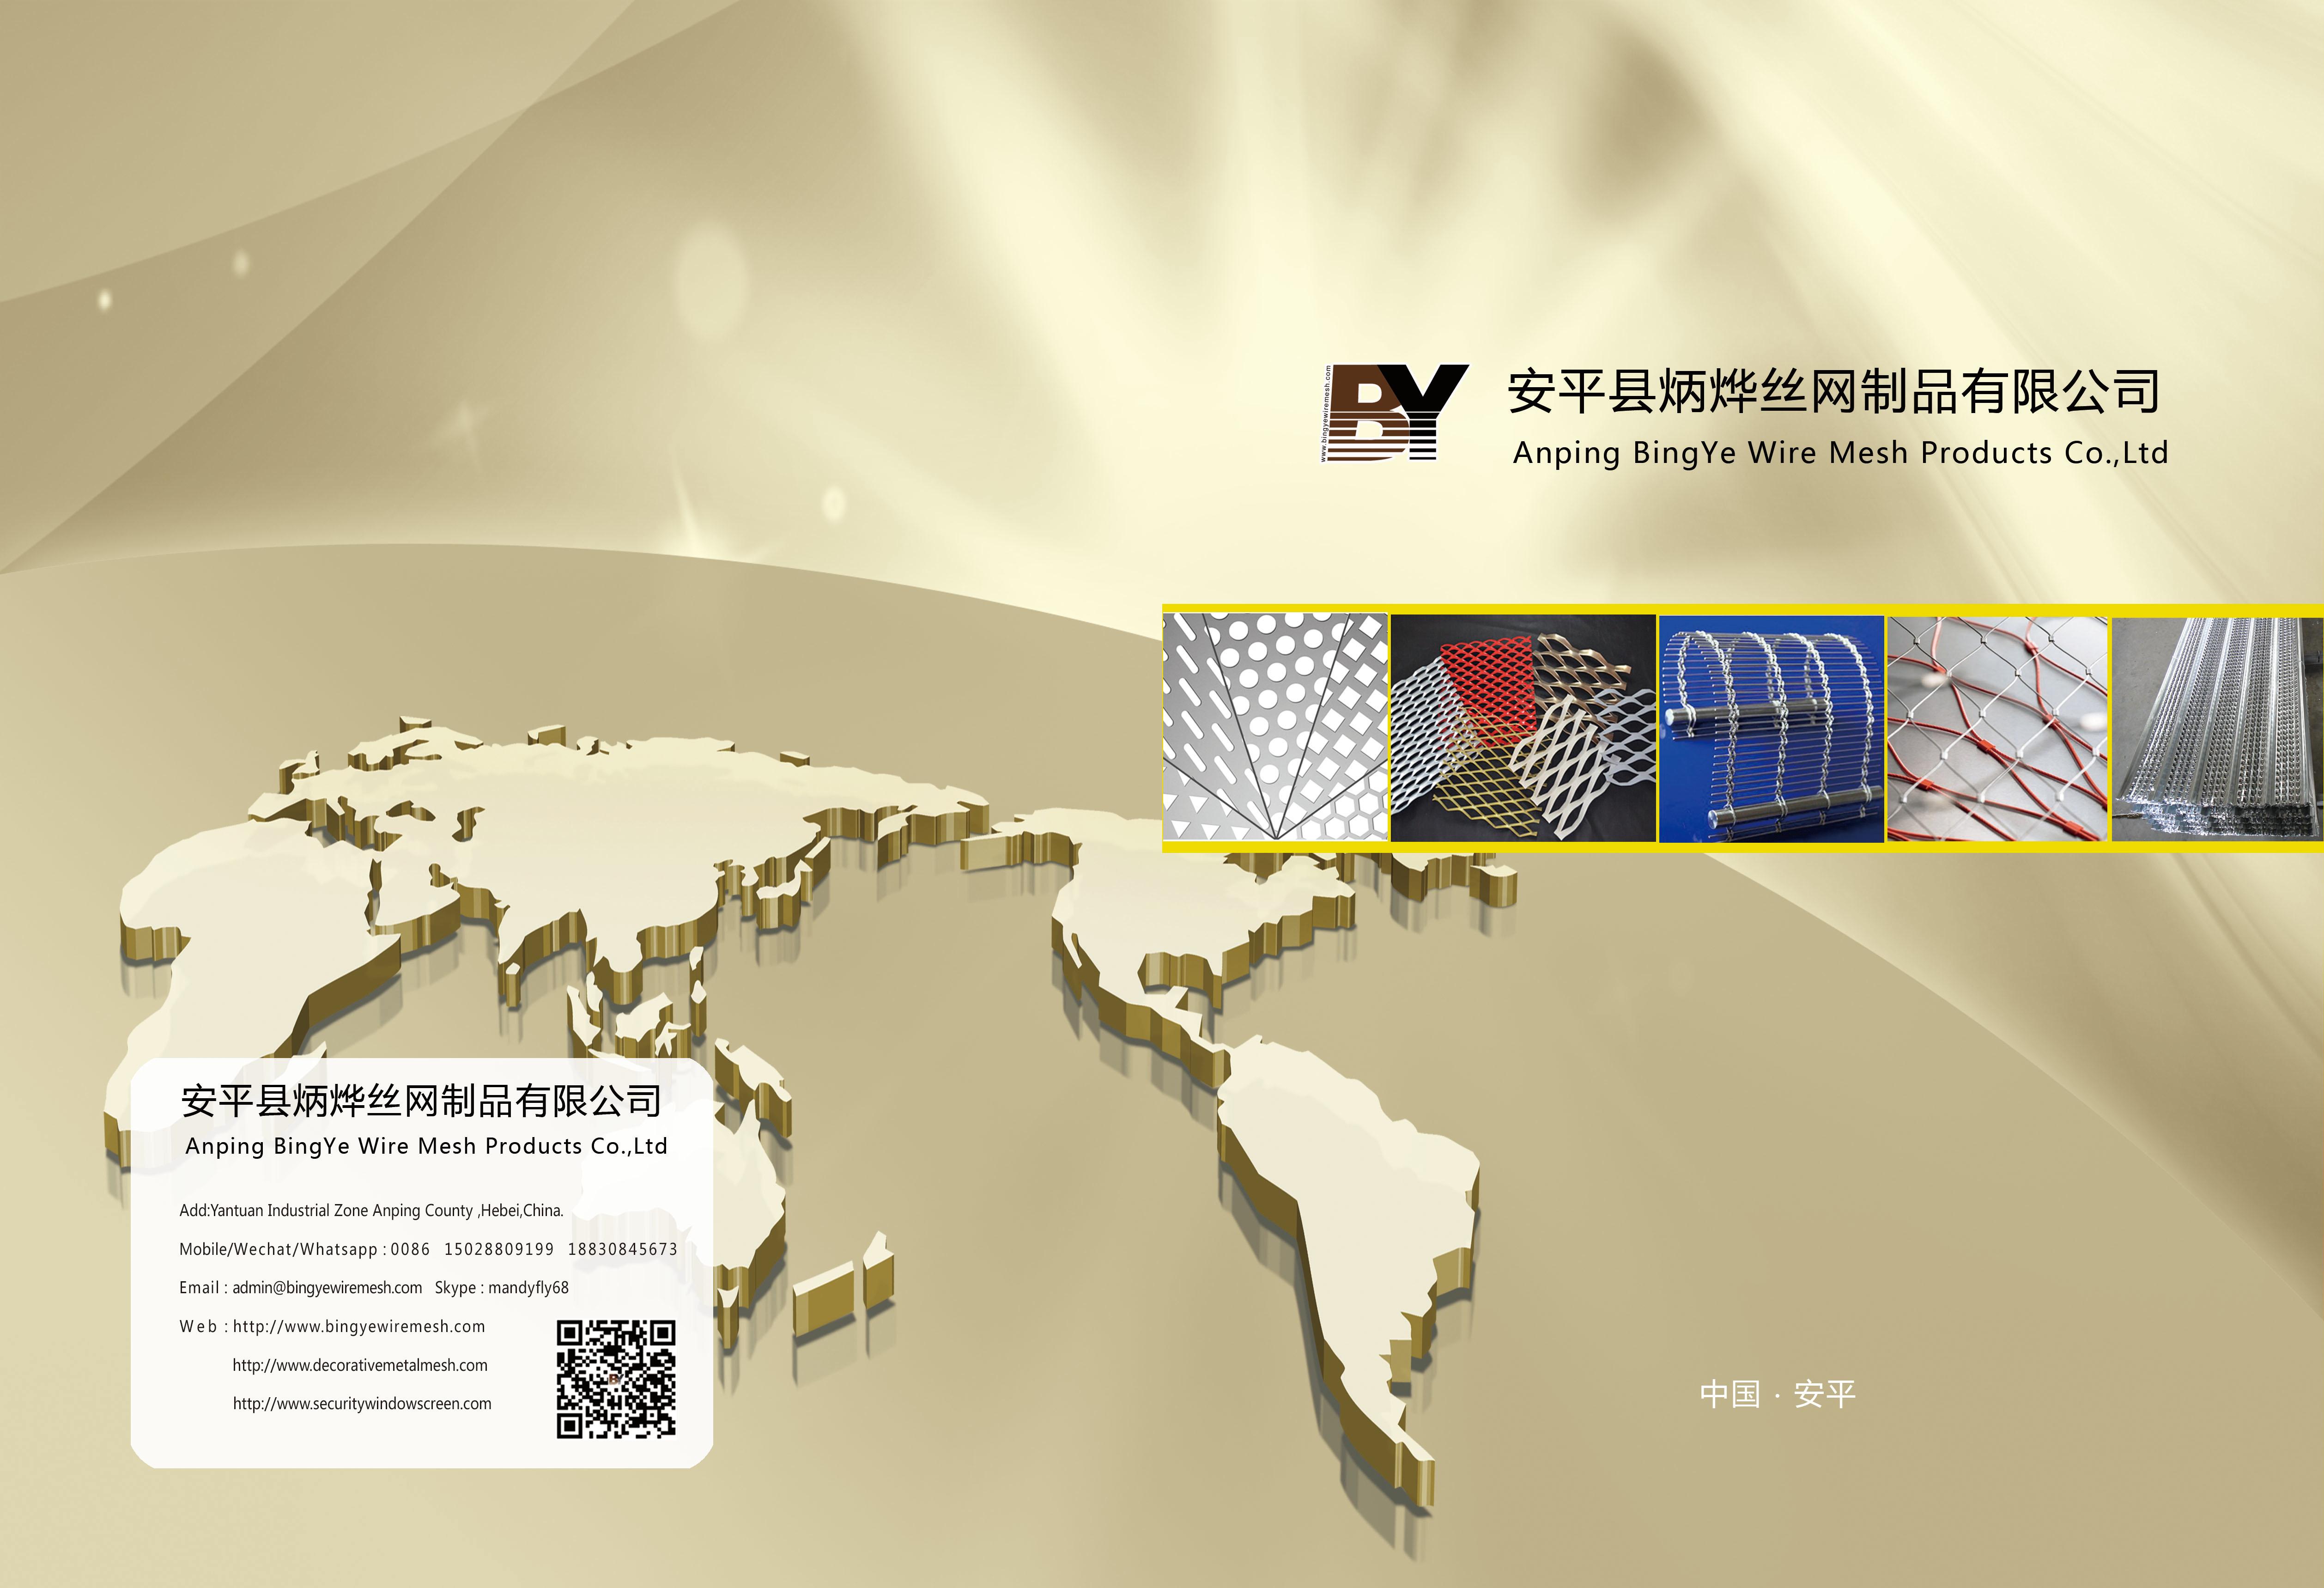 BingYe Wire Mesh Products Co.,Ltd